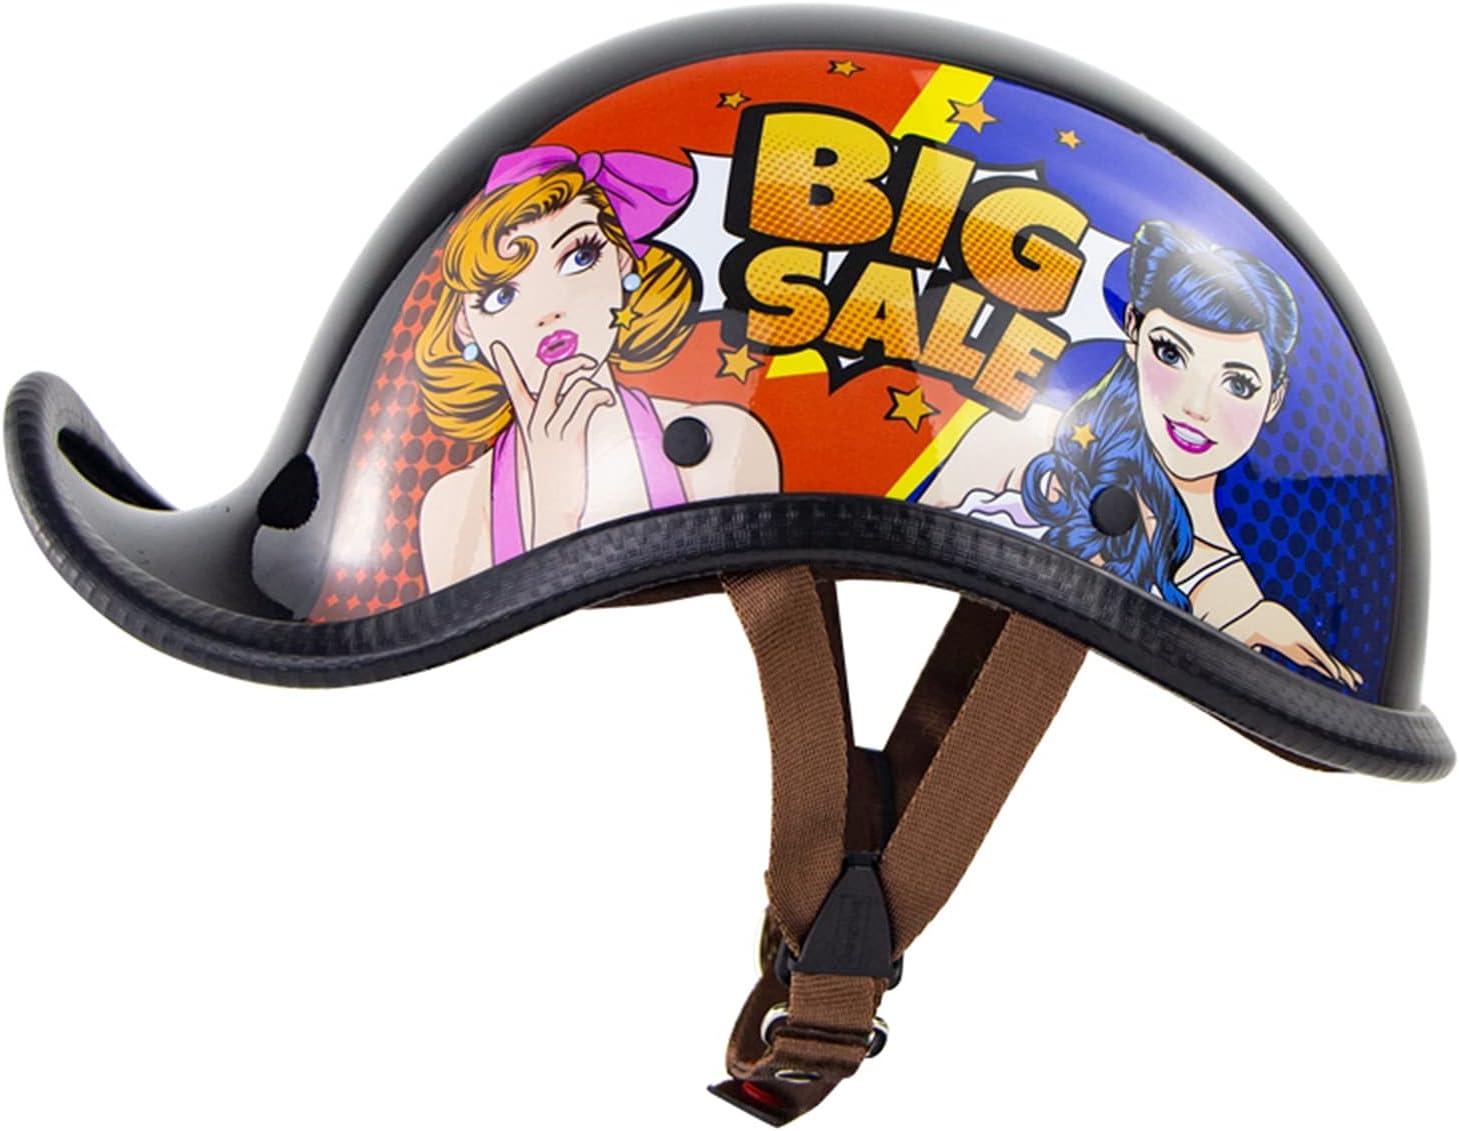 TCTCGXQ Retro Open Rapid rise Face Motorcycle Cruiser Half Chopper Fixed price for sale Helmets